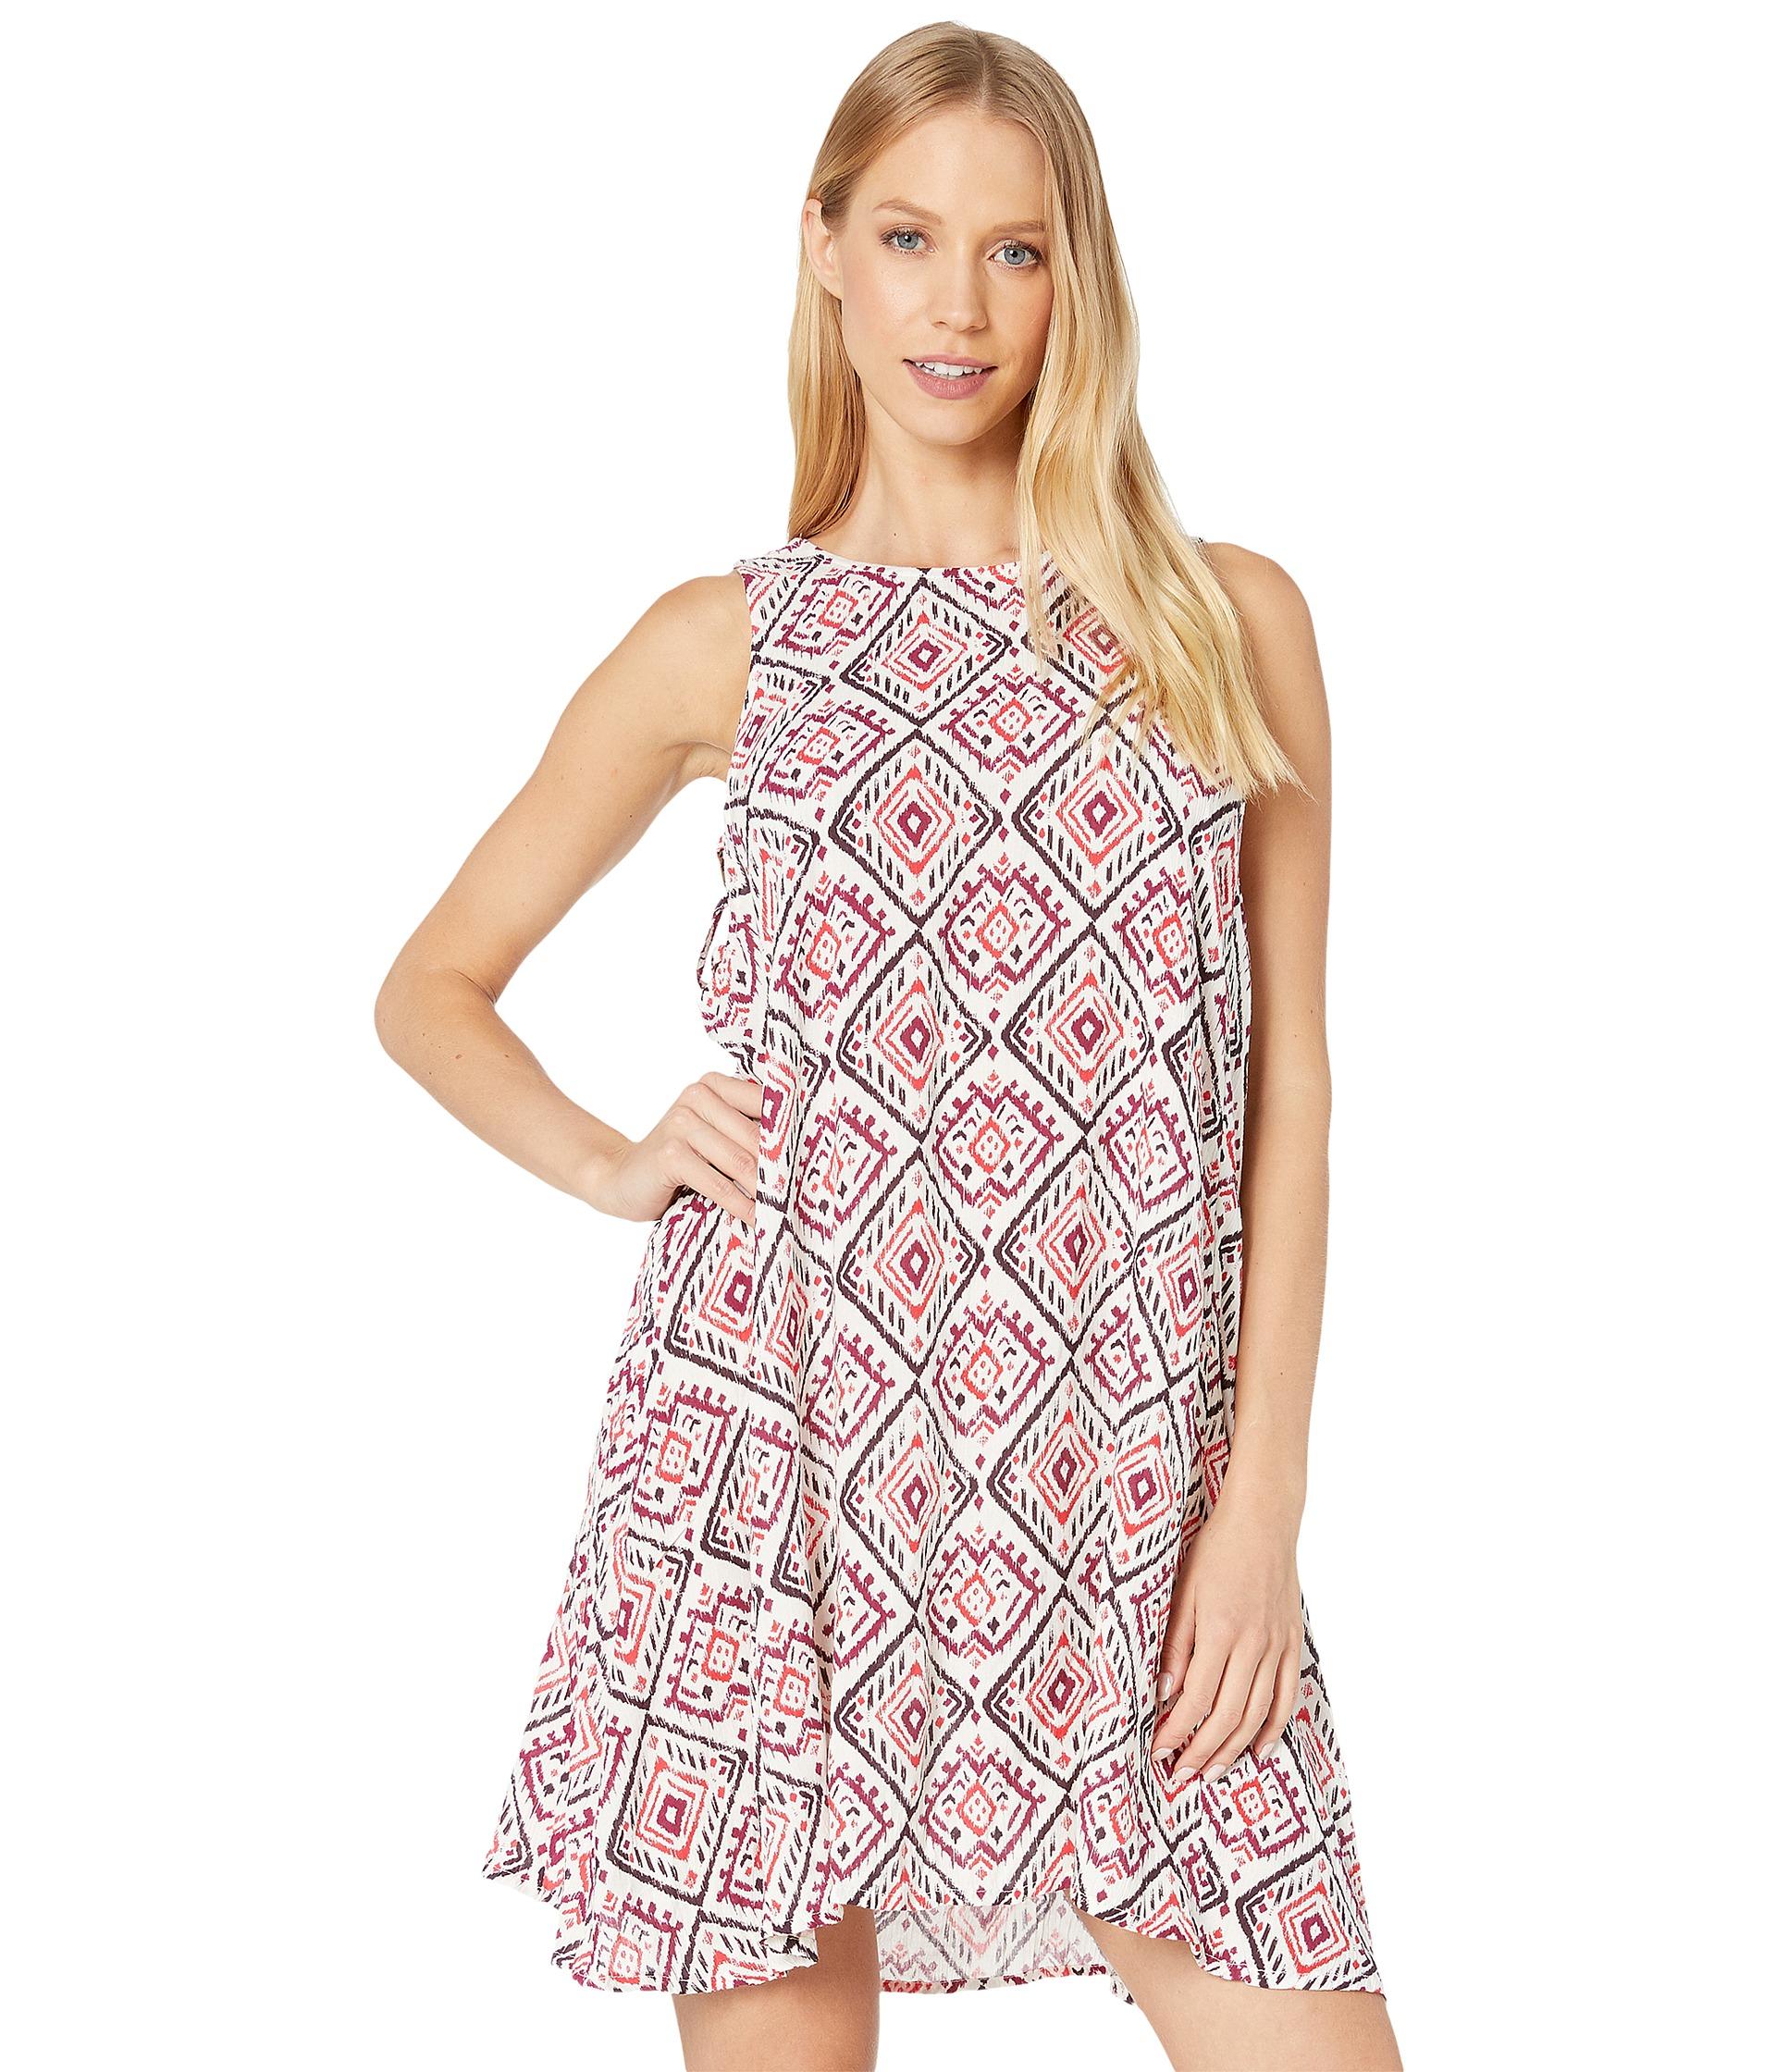 Roxy- Clothing- Women - Shipped Free at Zappos